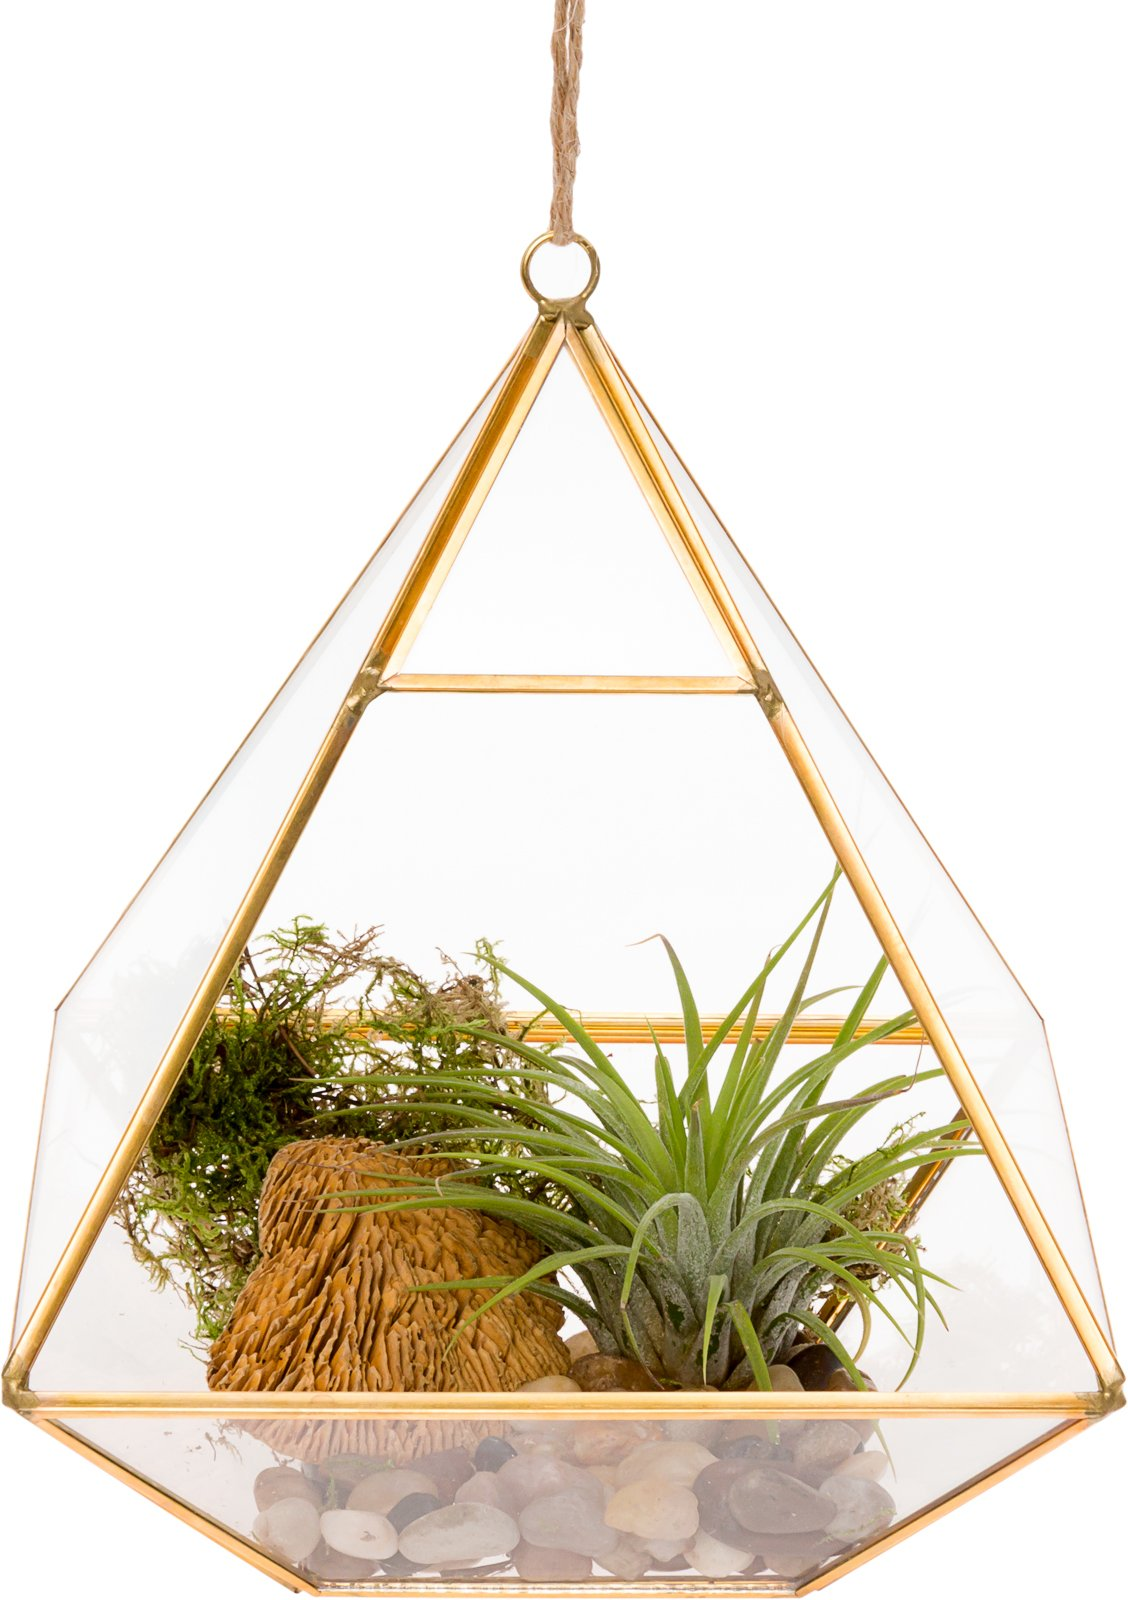 Mindful Design Glass Terrarium - Geometric Diamond Desktop Garden Planter by (Gold)